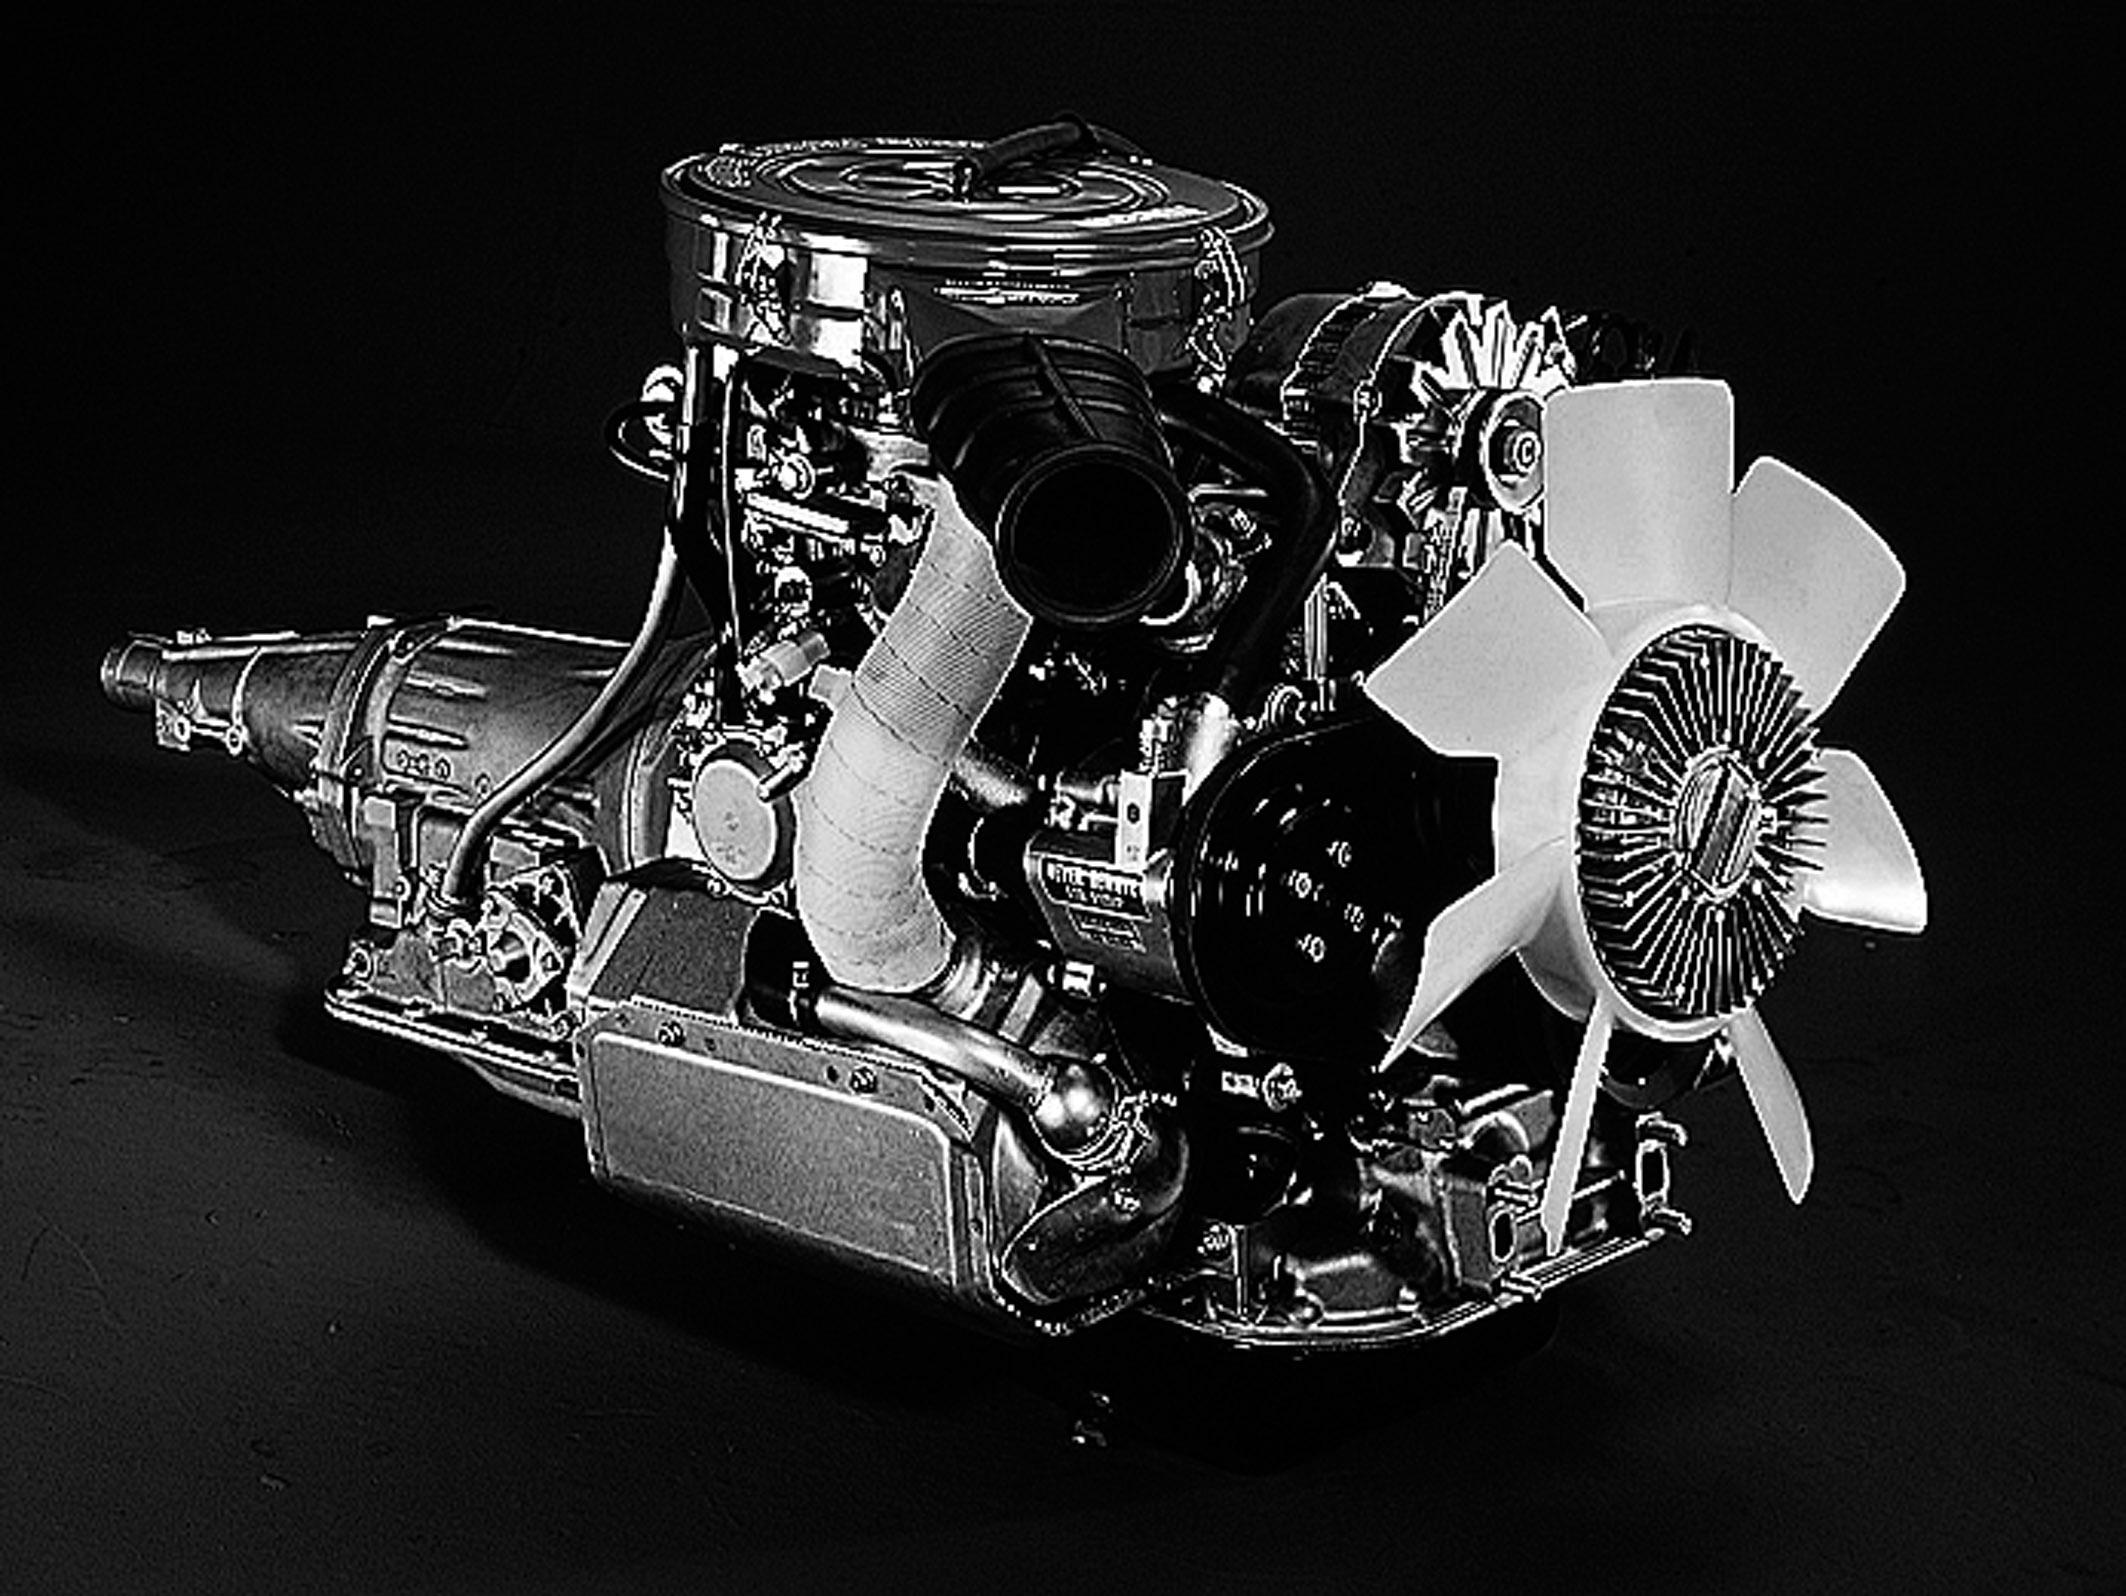 40th 13B Rotary Engine